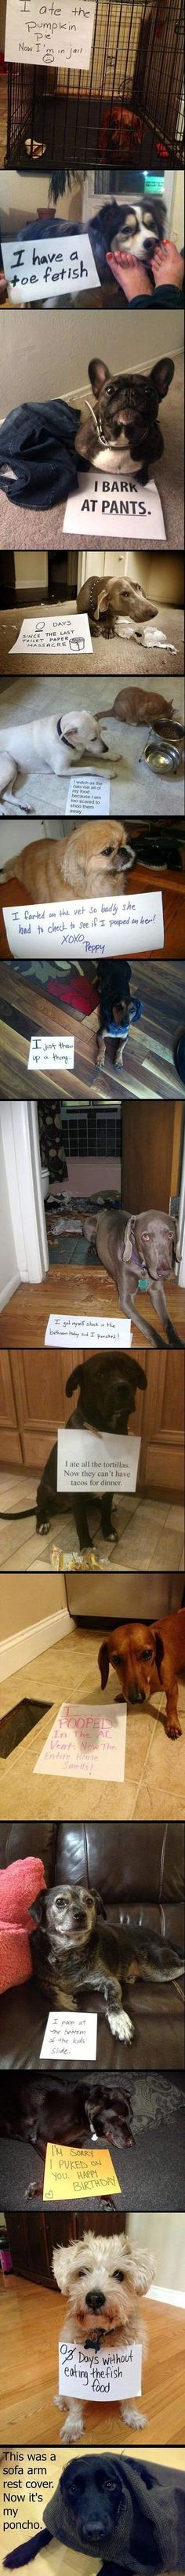 Dog Shaming Confession Signs (compilation)